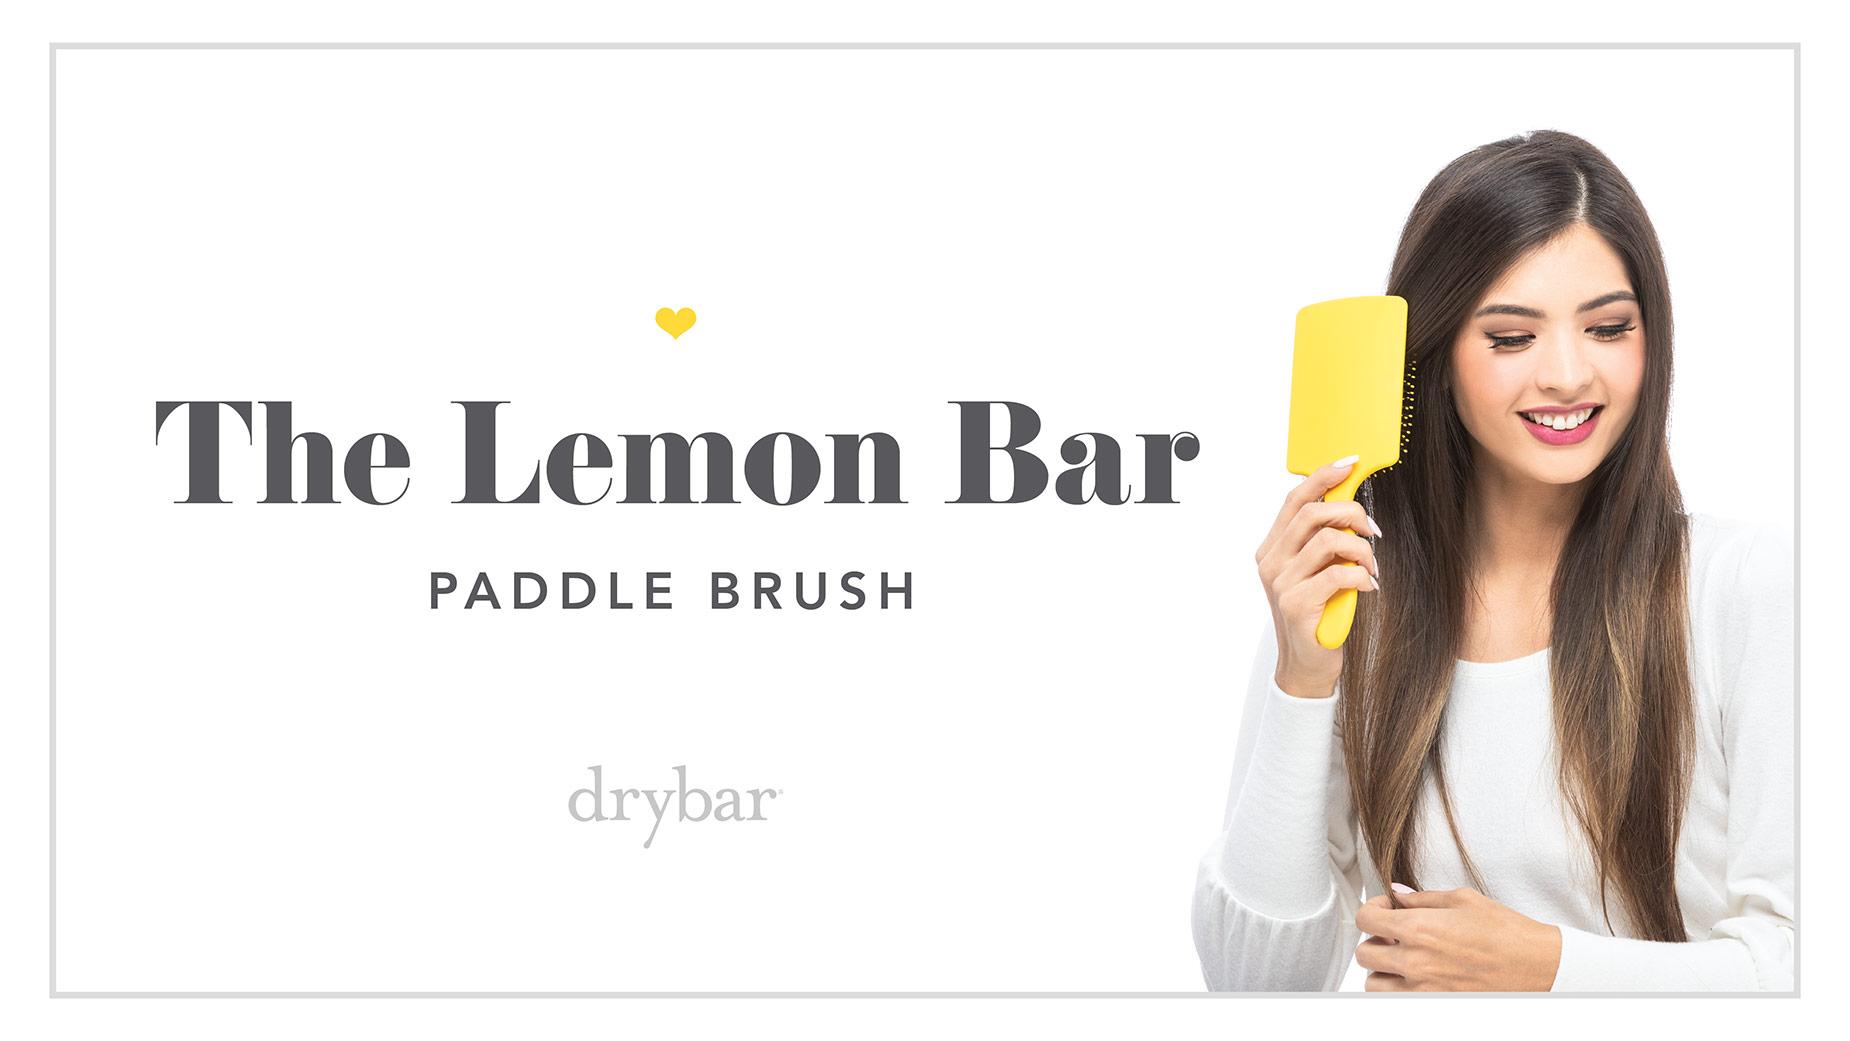 The Lemon Bar Paddle Brush Video